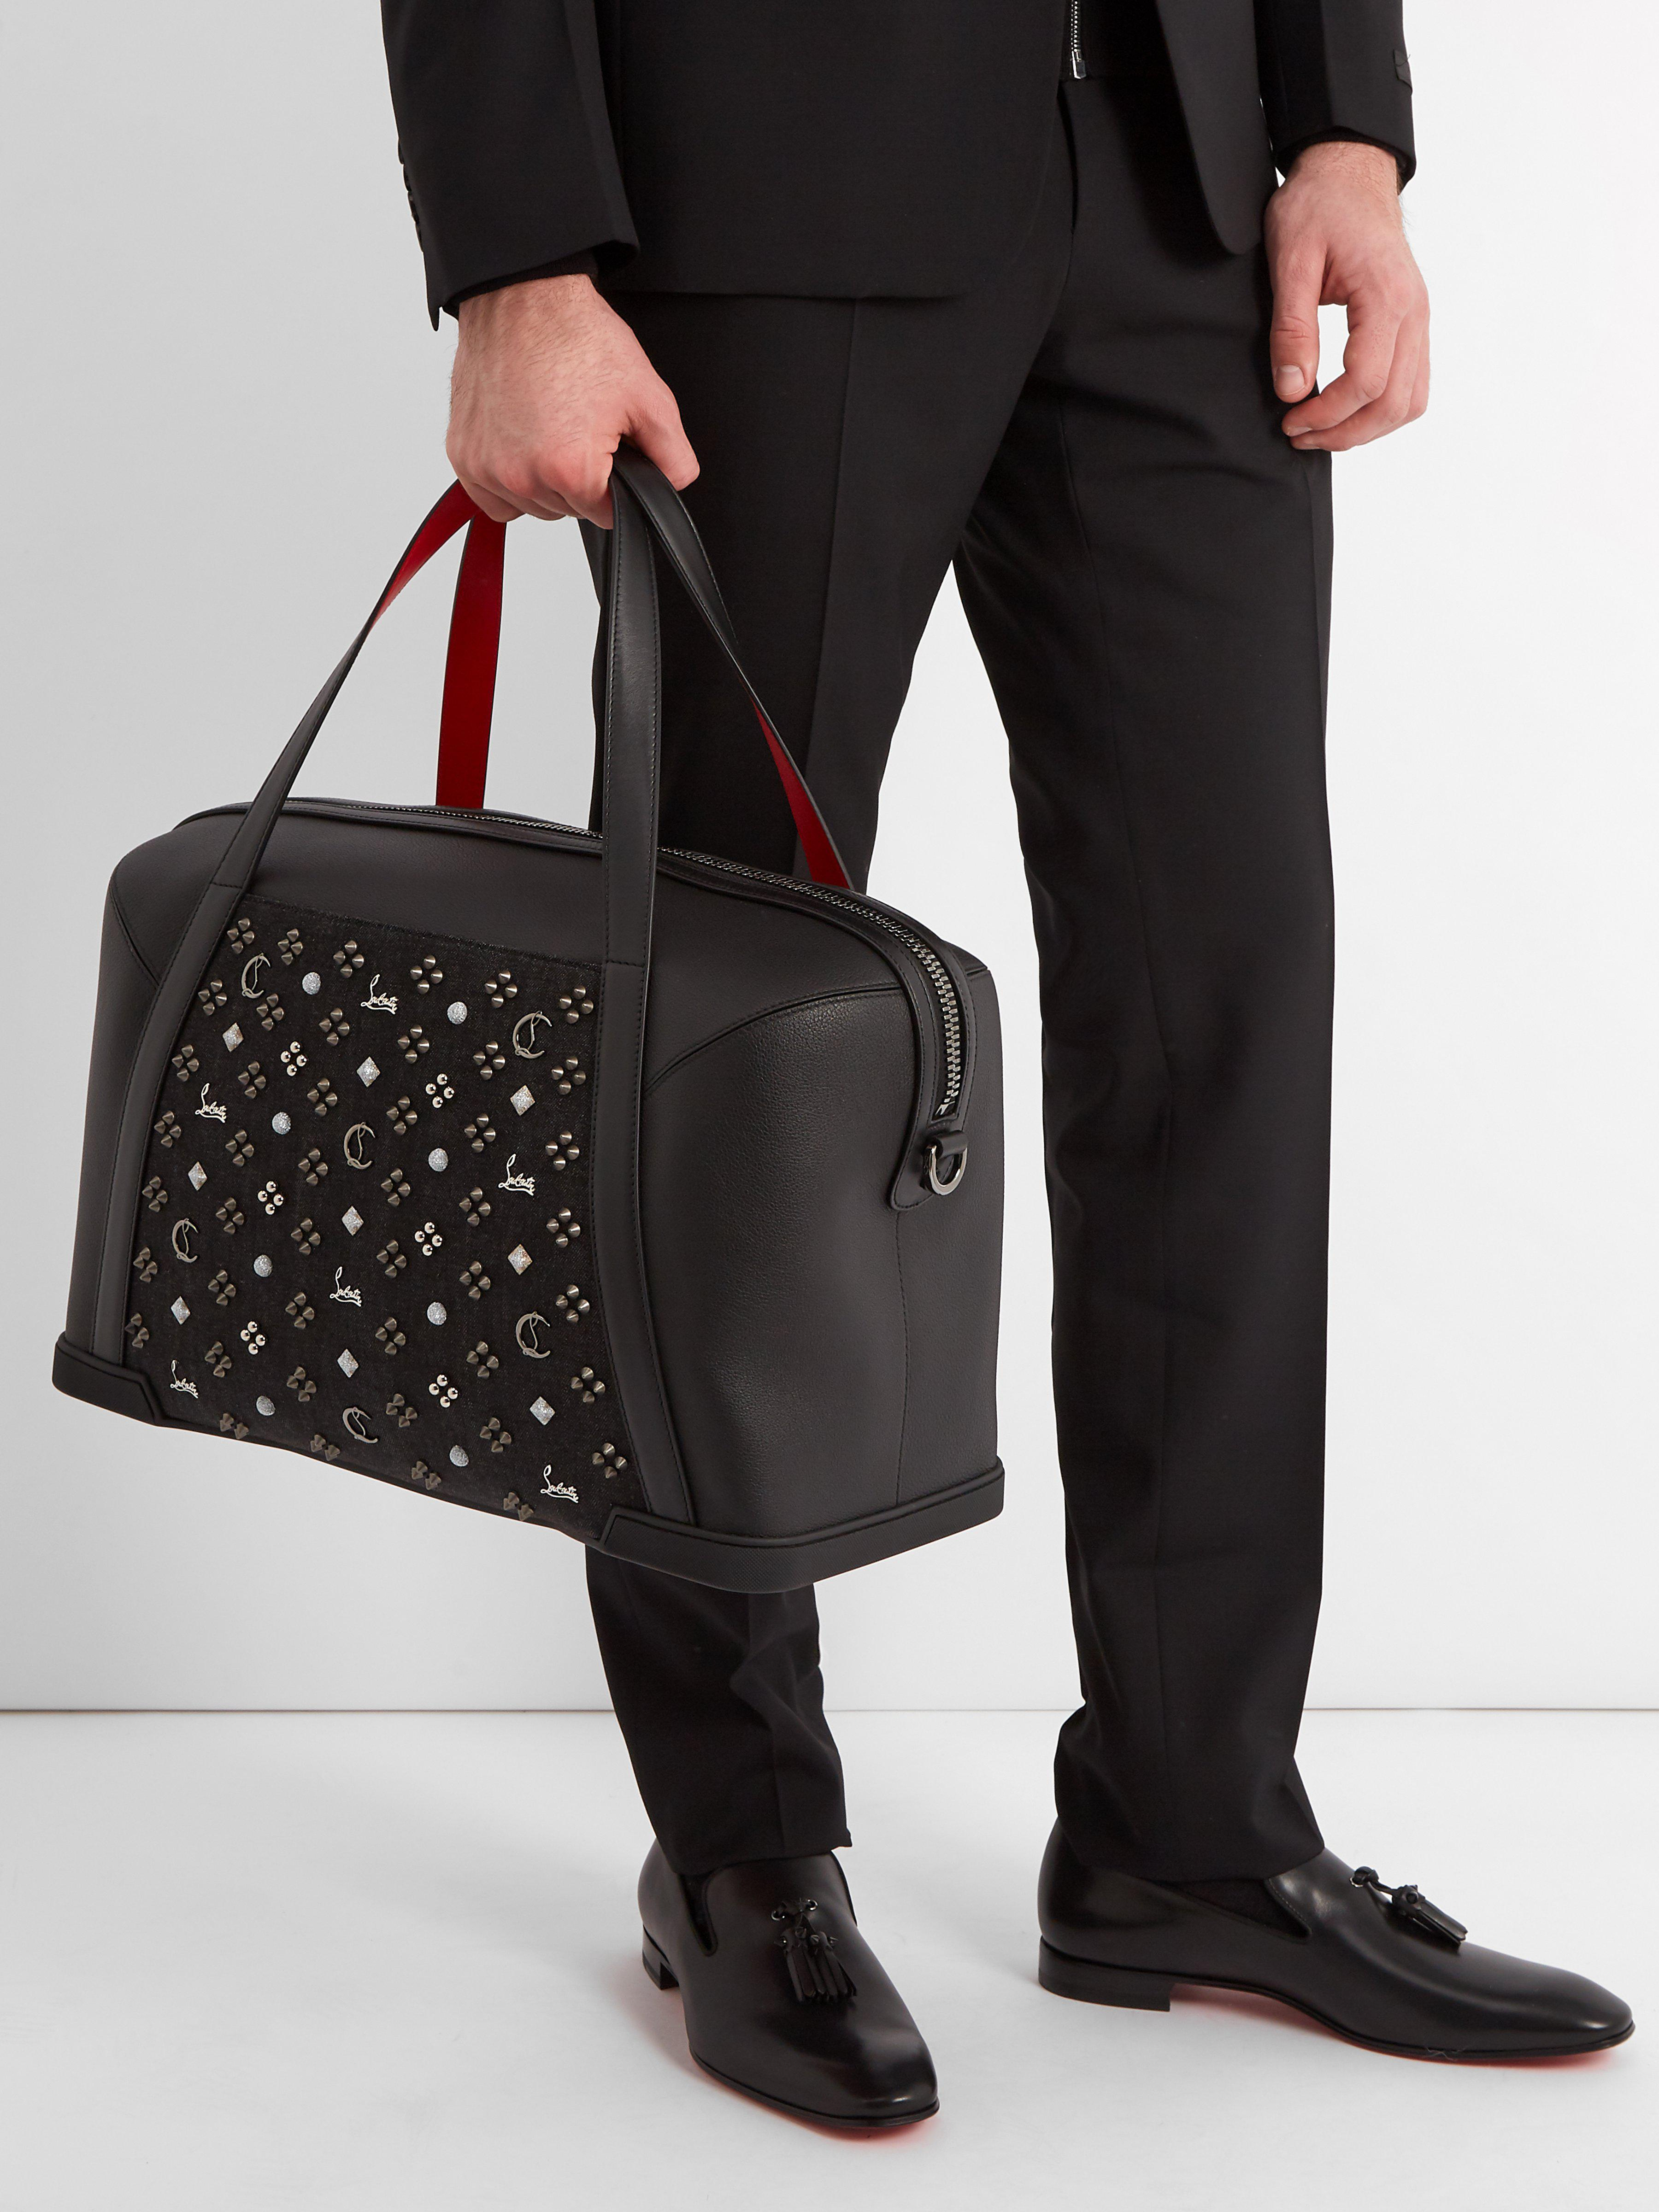 669f9b4b887 Christian Louboutin Bagdamon Spike Embellished Leather Holdall in Black for  Men - Lyst